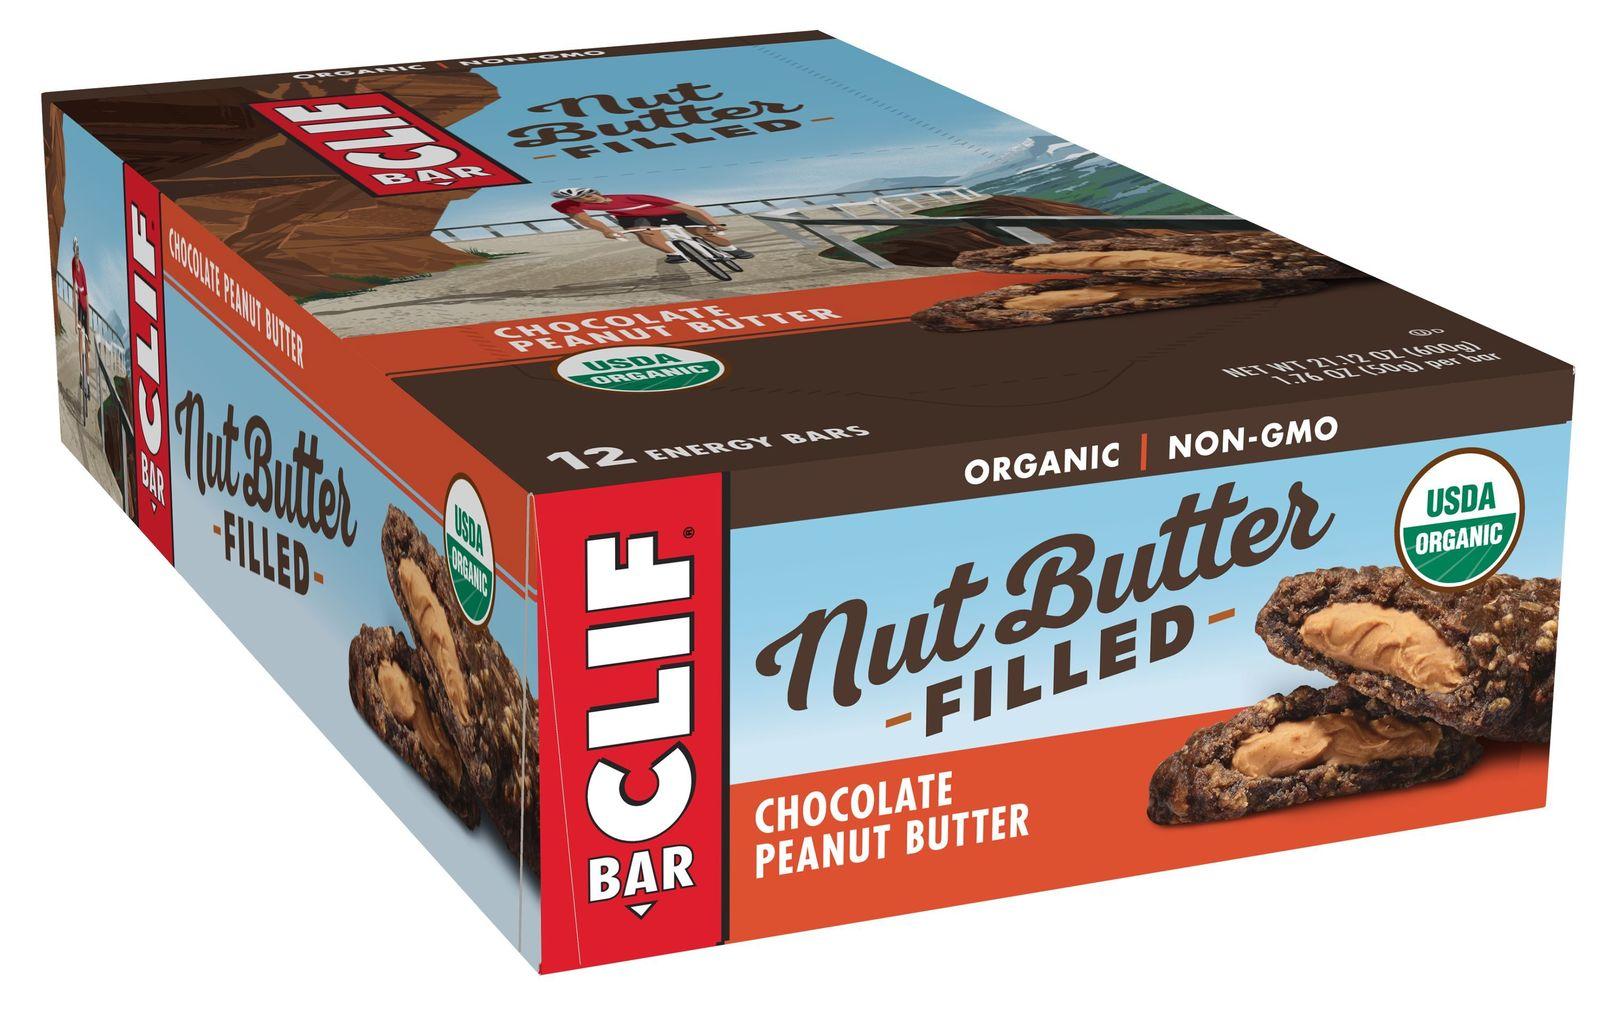 Clif Bar Nut Butter Filled - Chocolate Peanut Butter (12x50g) image